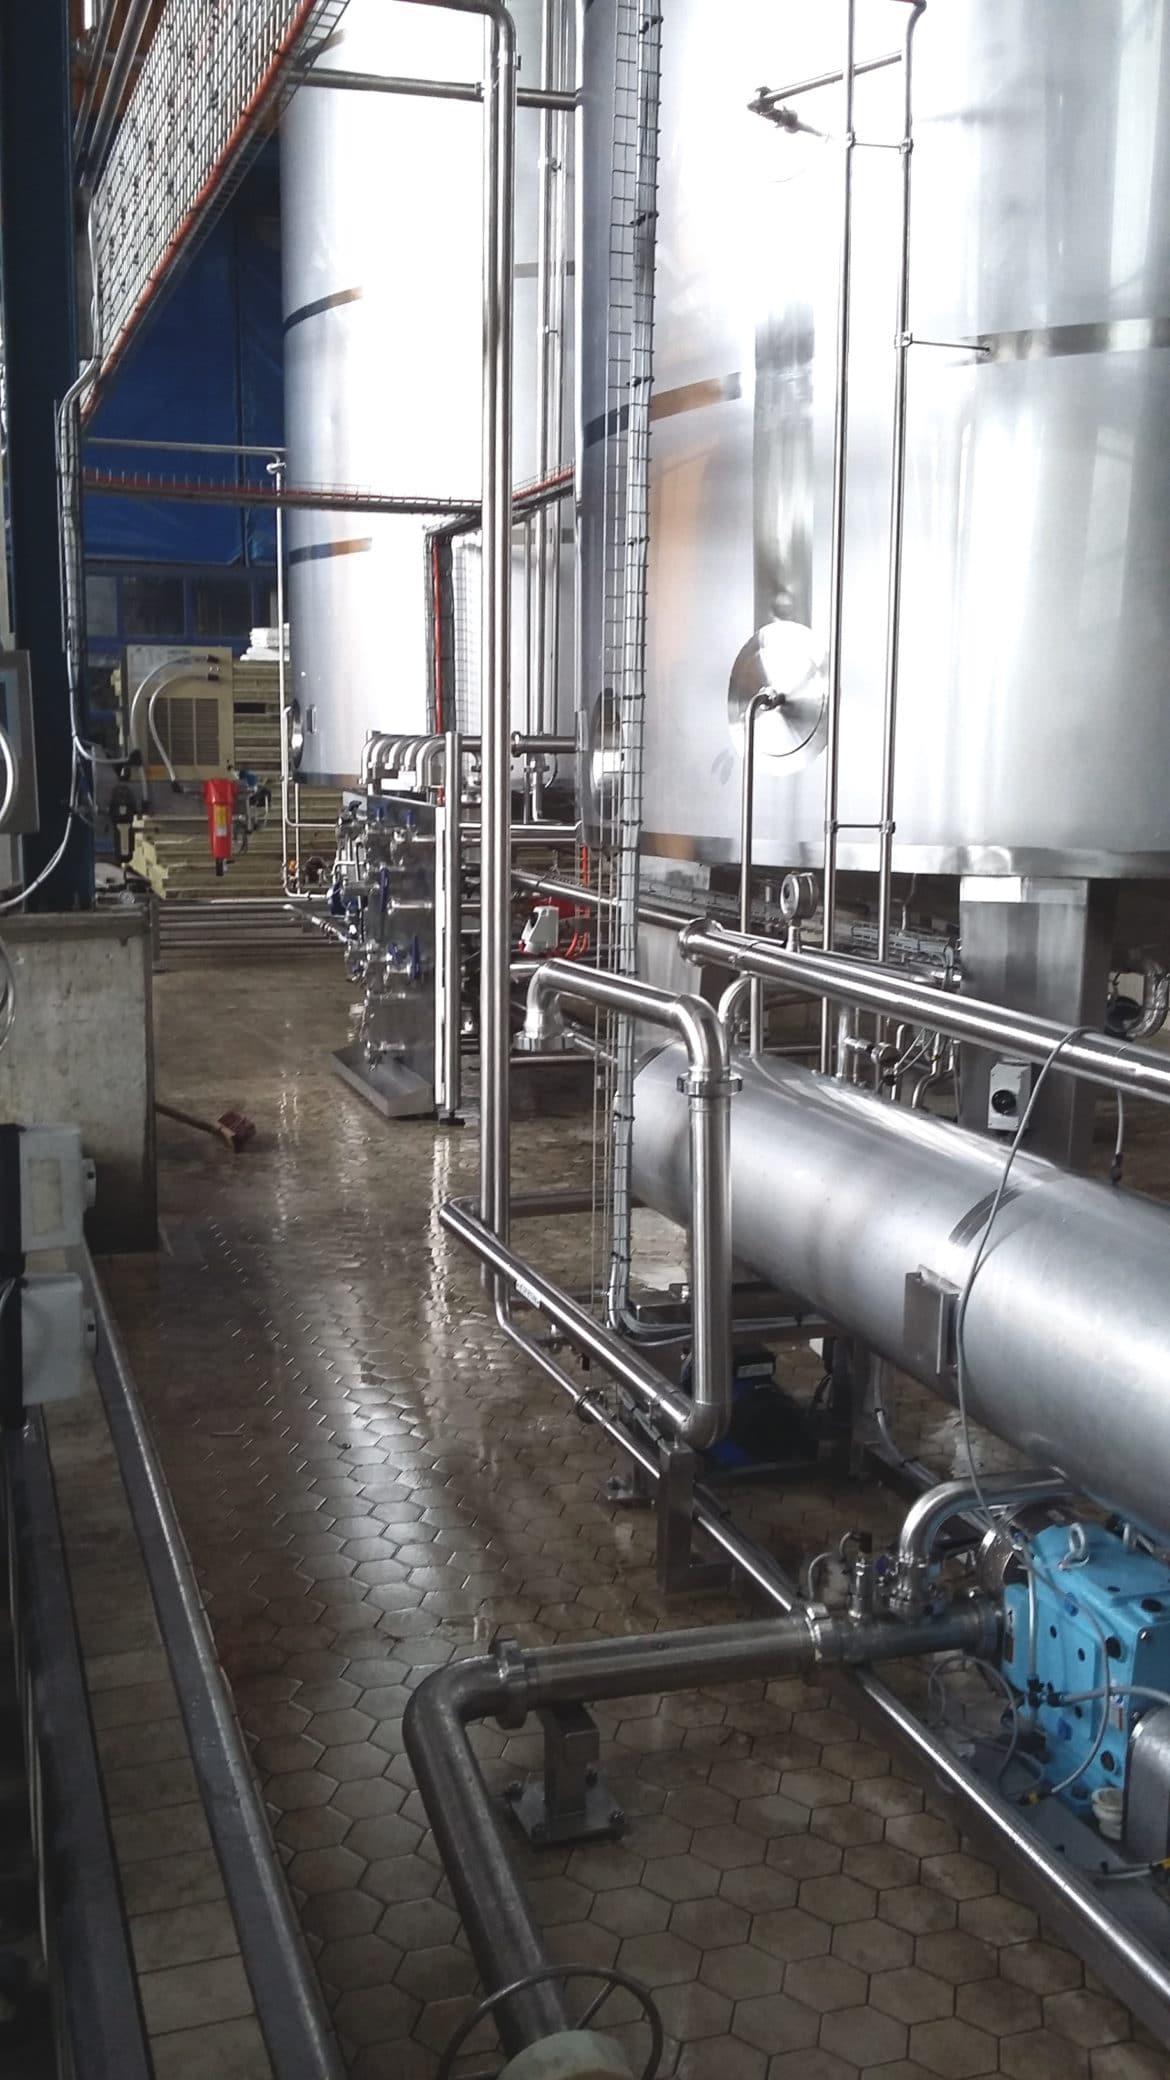 castle milk stout, maltose handling project for sabm nigeria